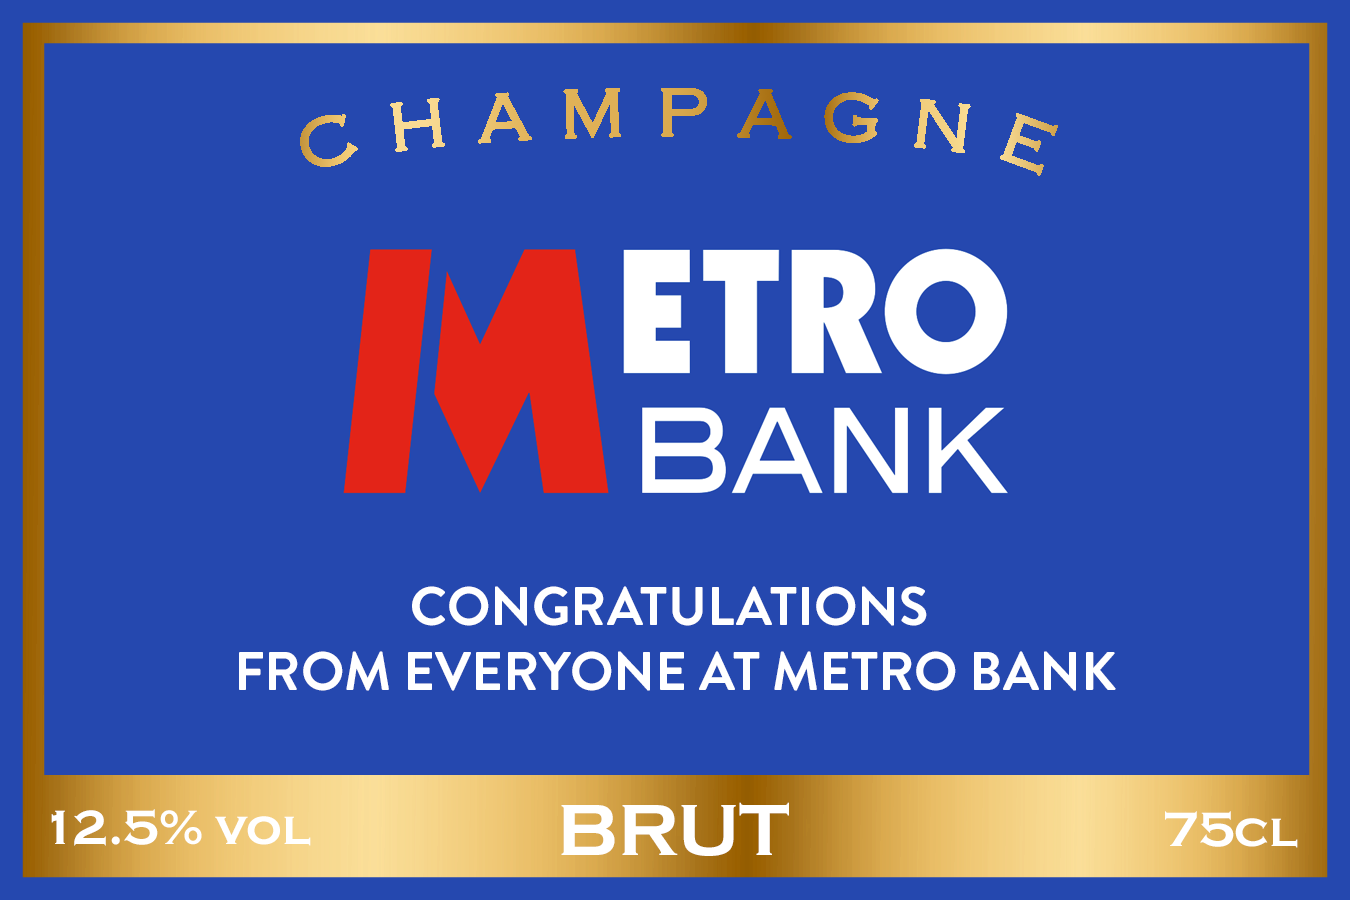 Metro Bank Branded Champagne Label